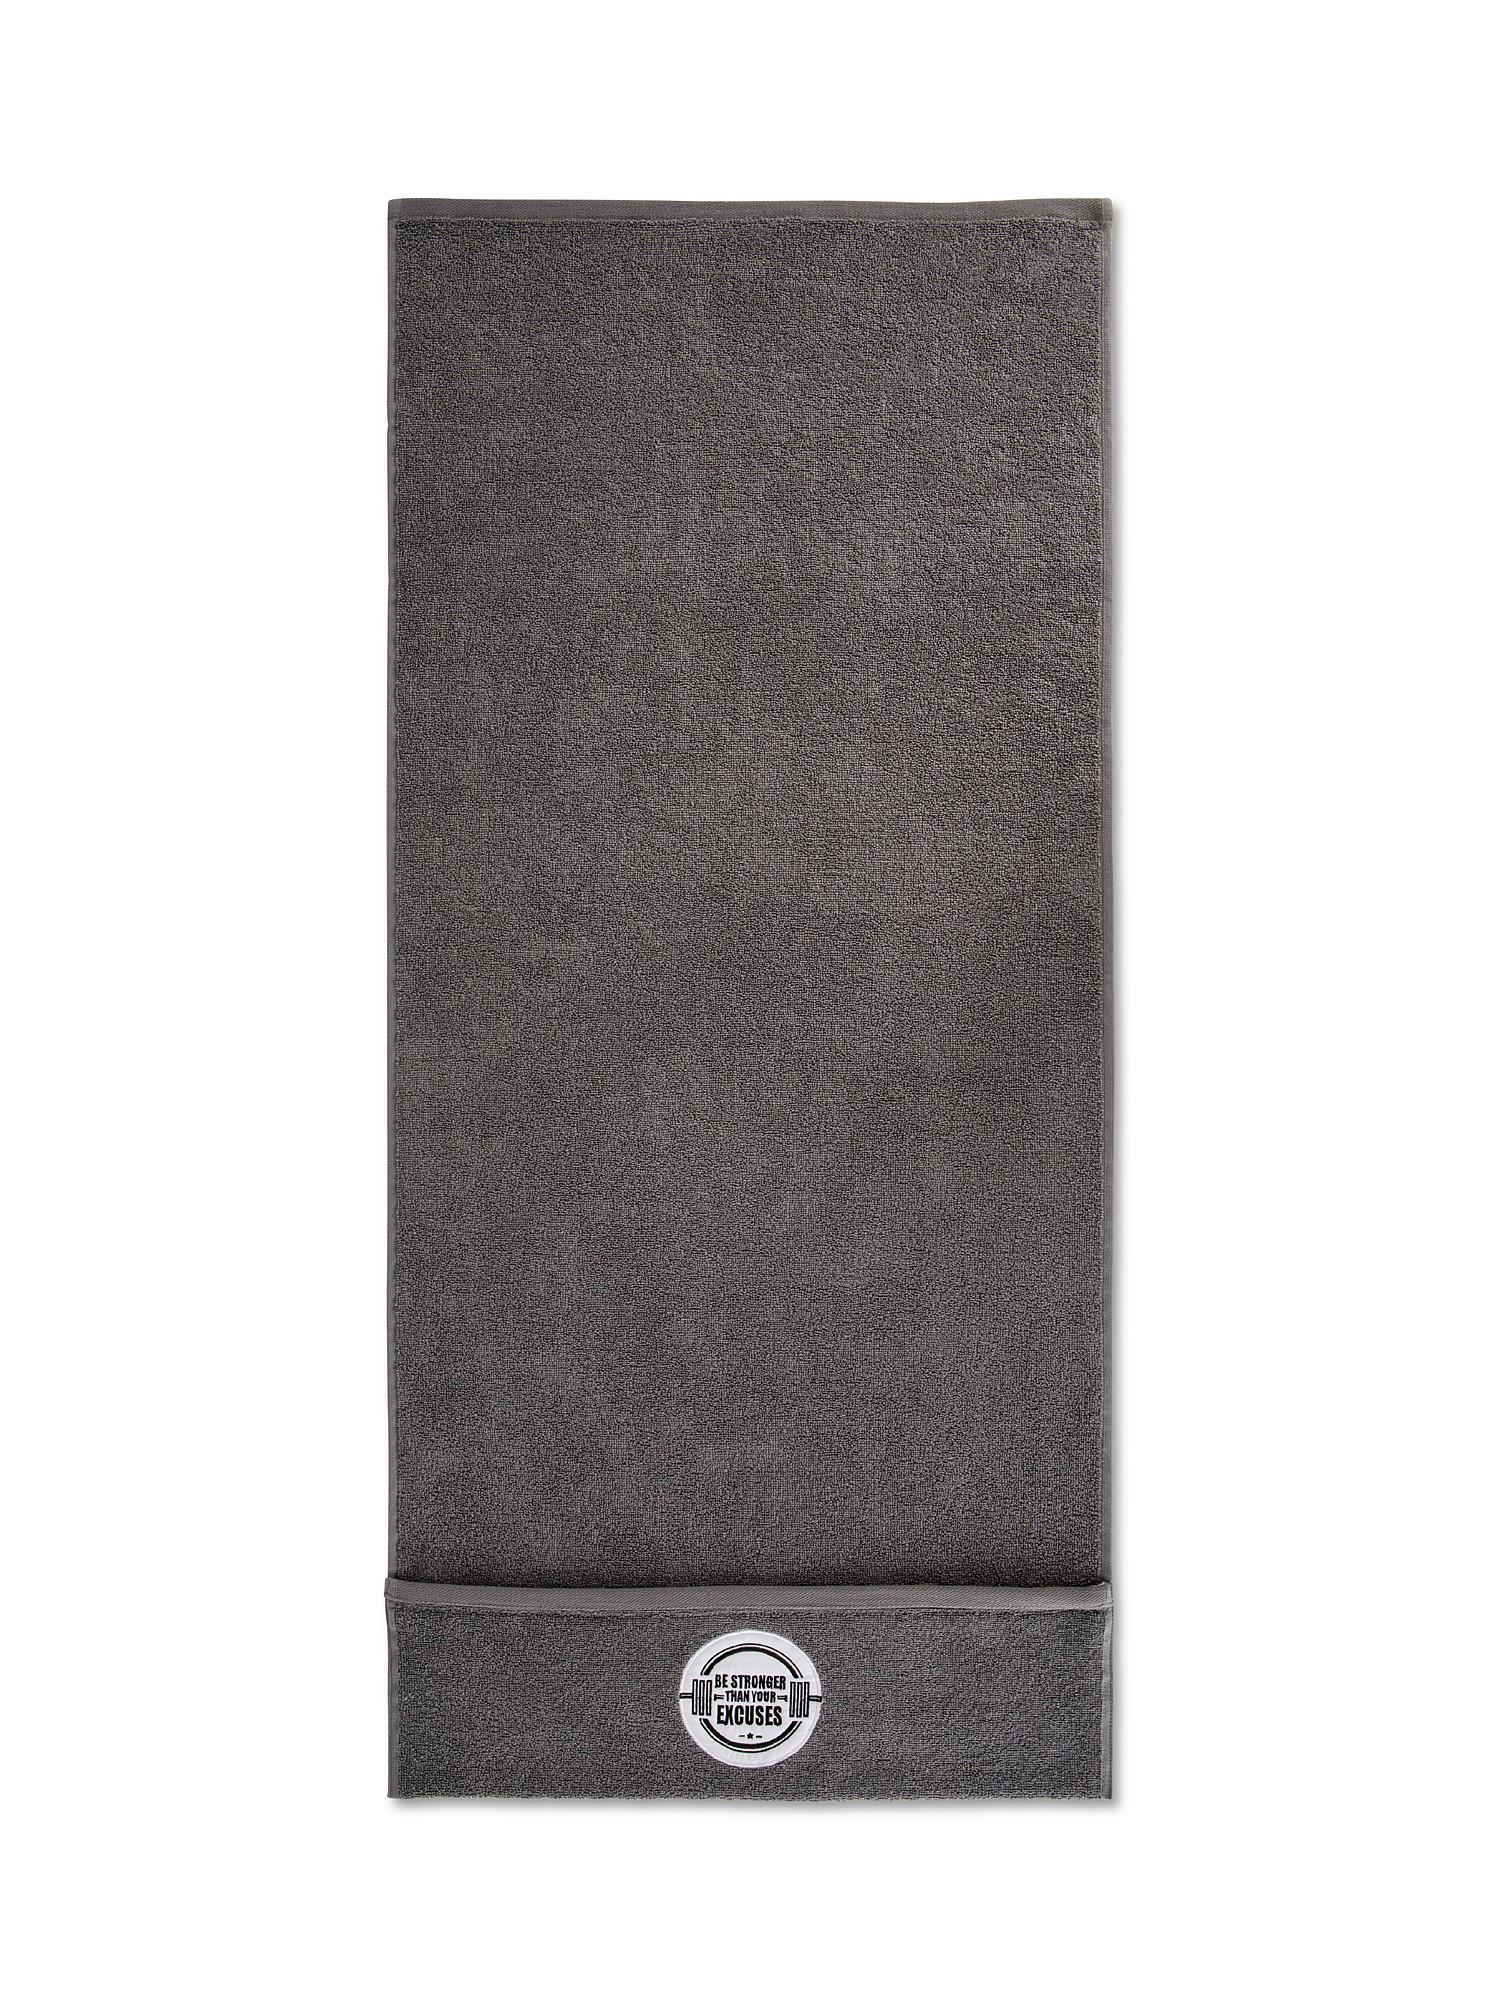 Asciugamano da palestra e fitness, Grigio, large image number 1